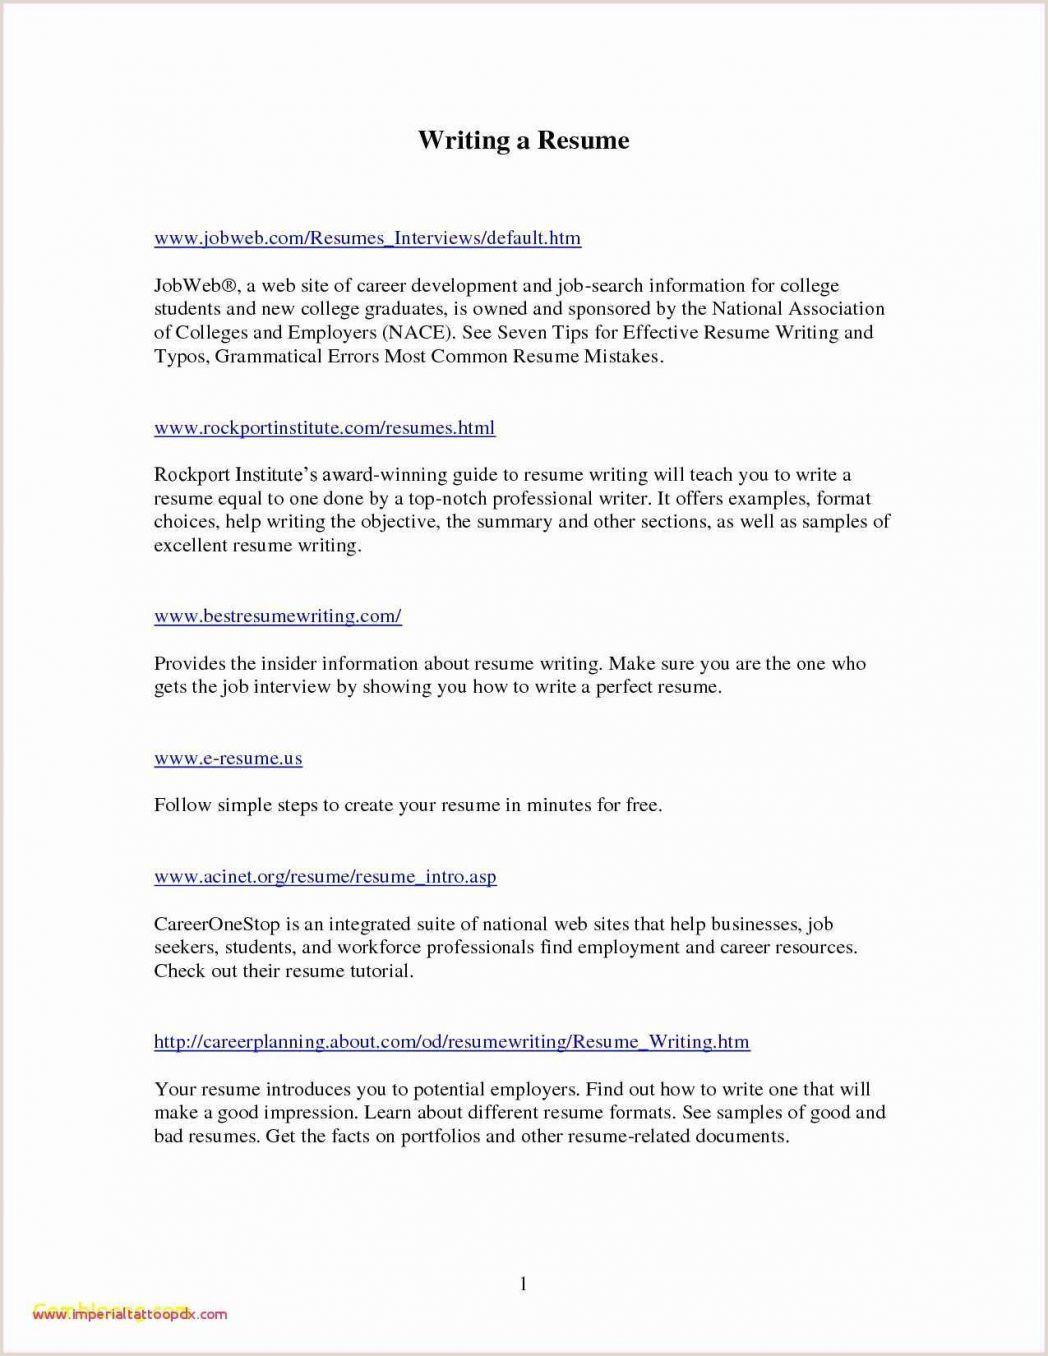 Professional Cv Examples Pdf Simple format Sansu Rabionetassociats Cv Sample Letter